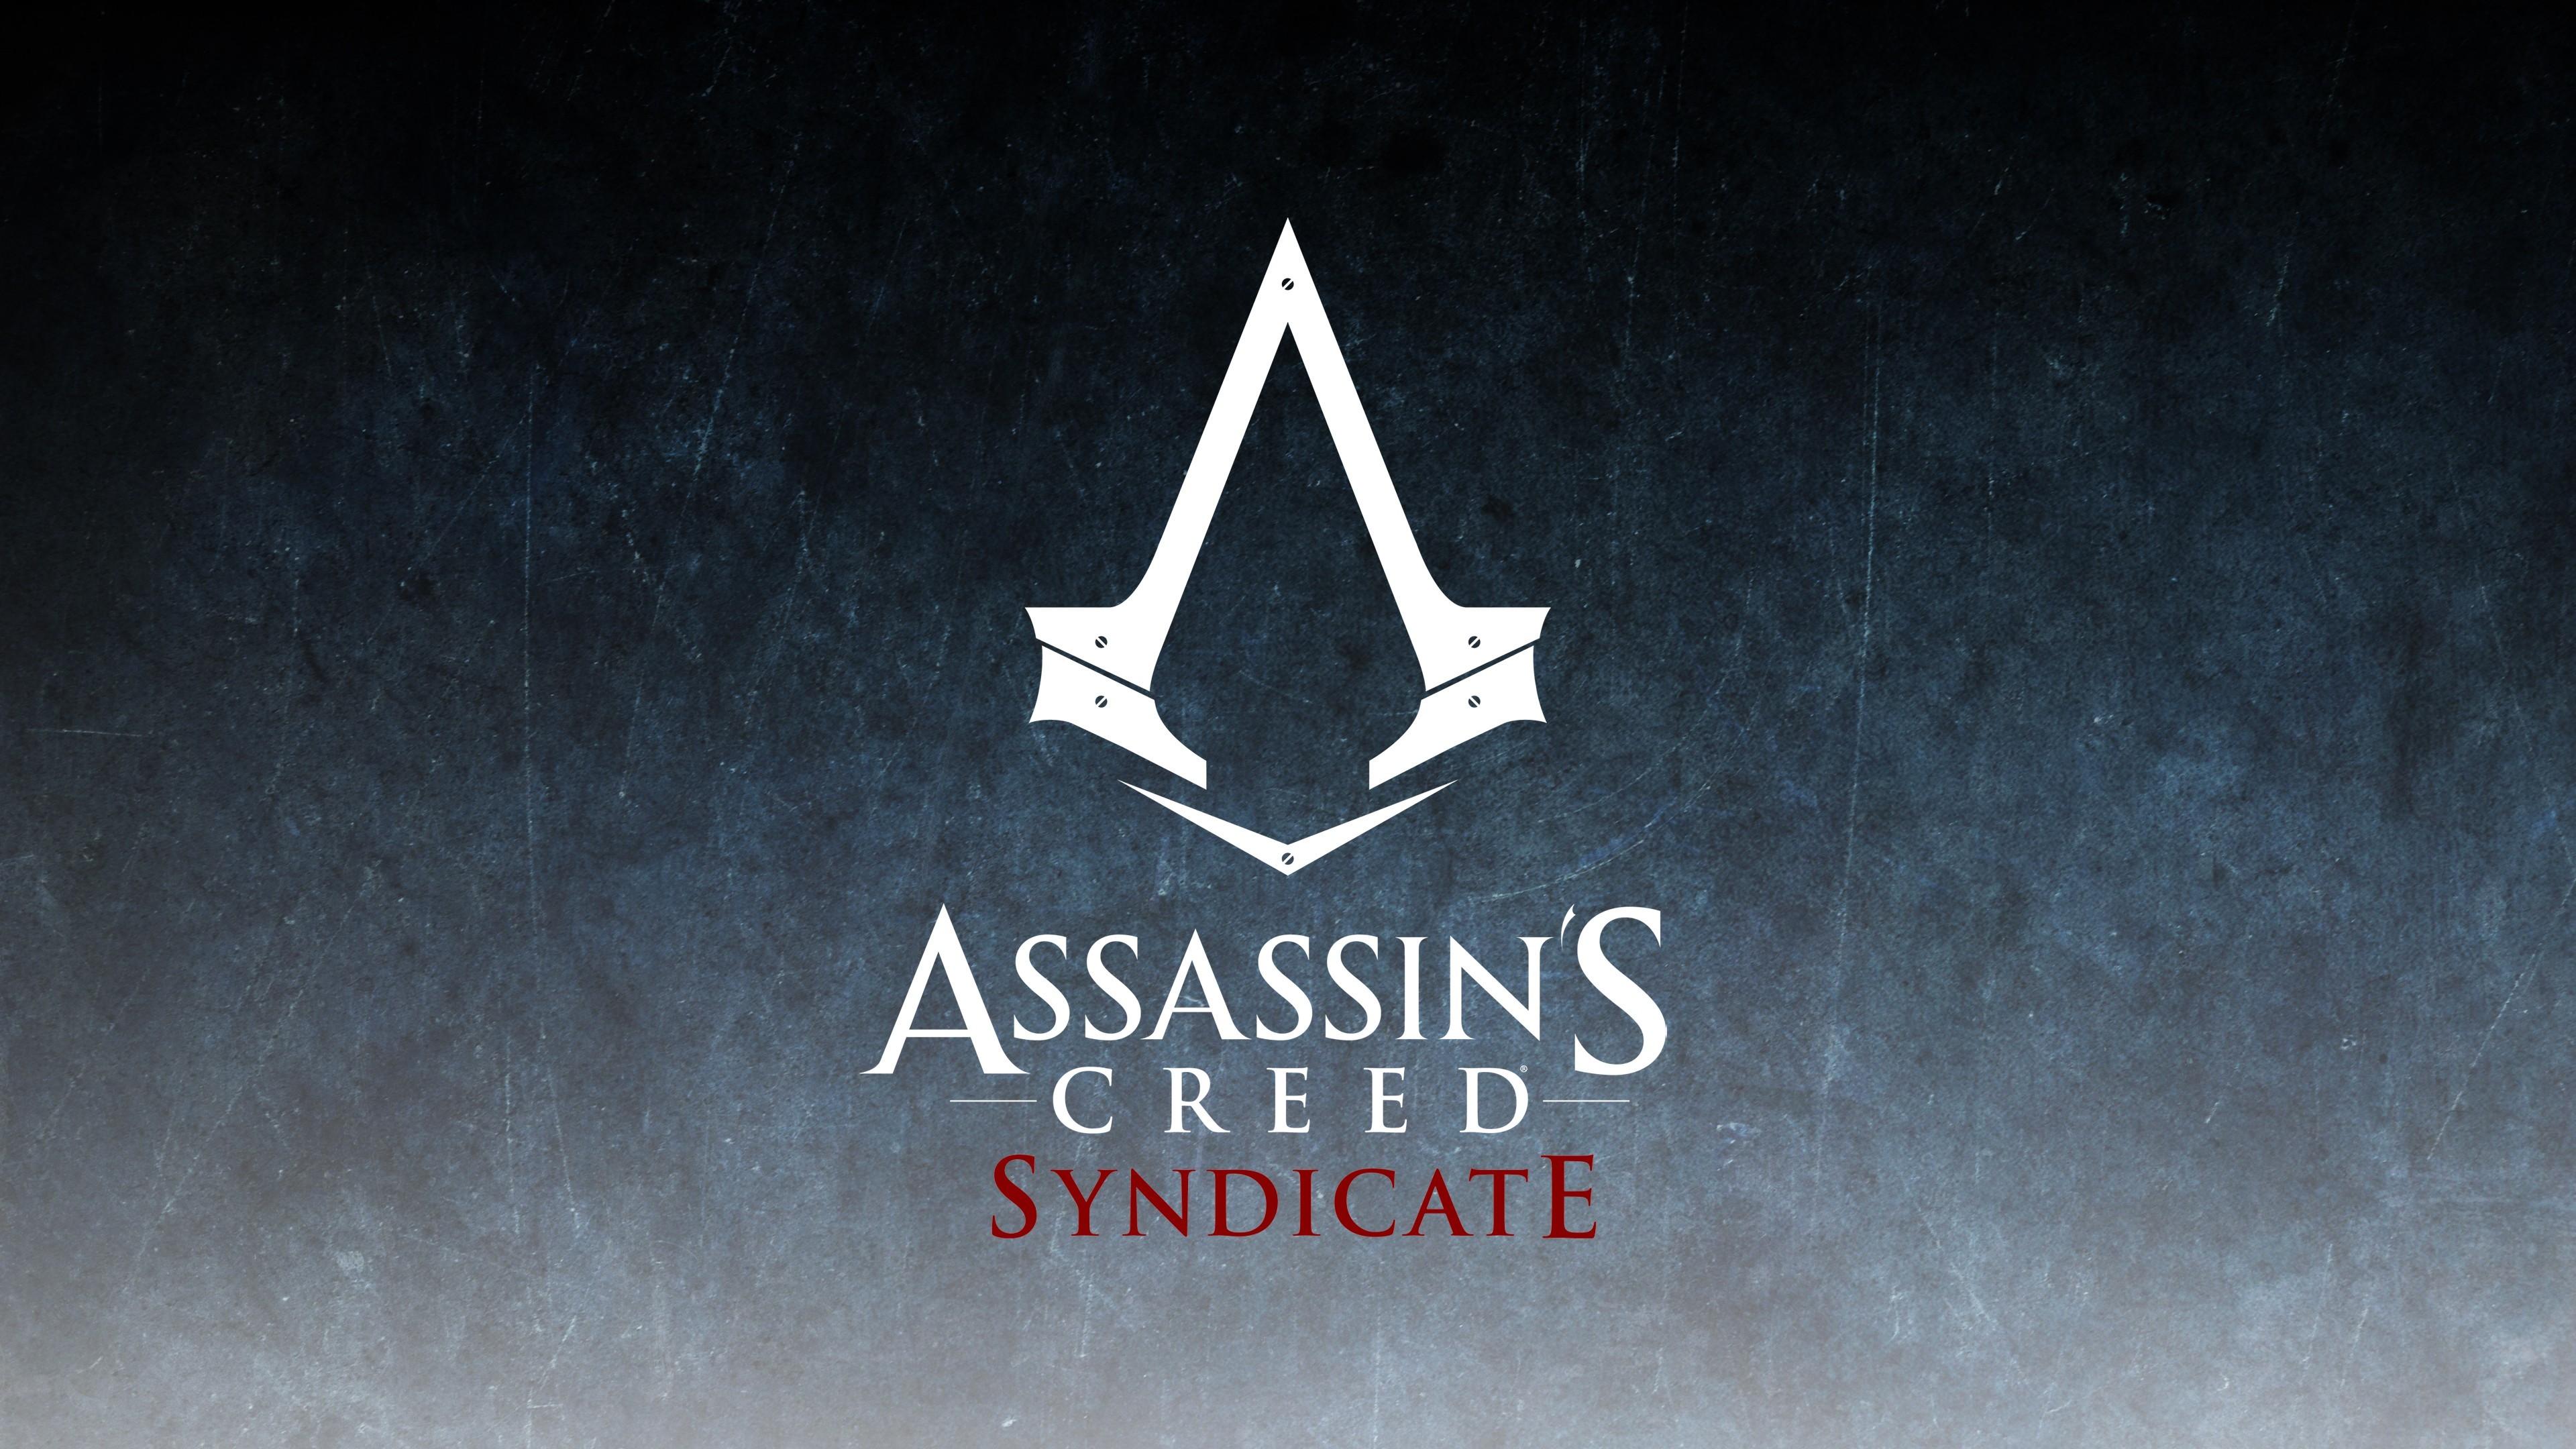 Assassins Creed Logo Wallpaper #6874086